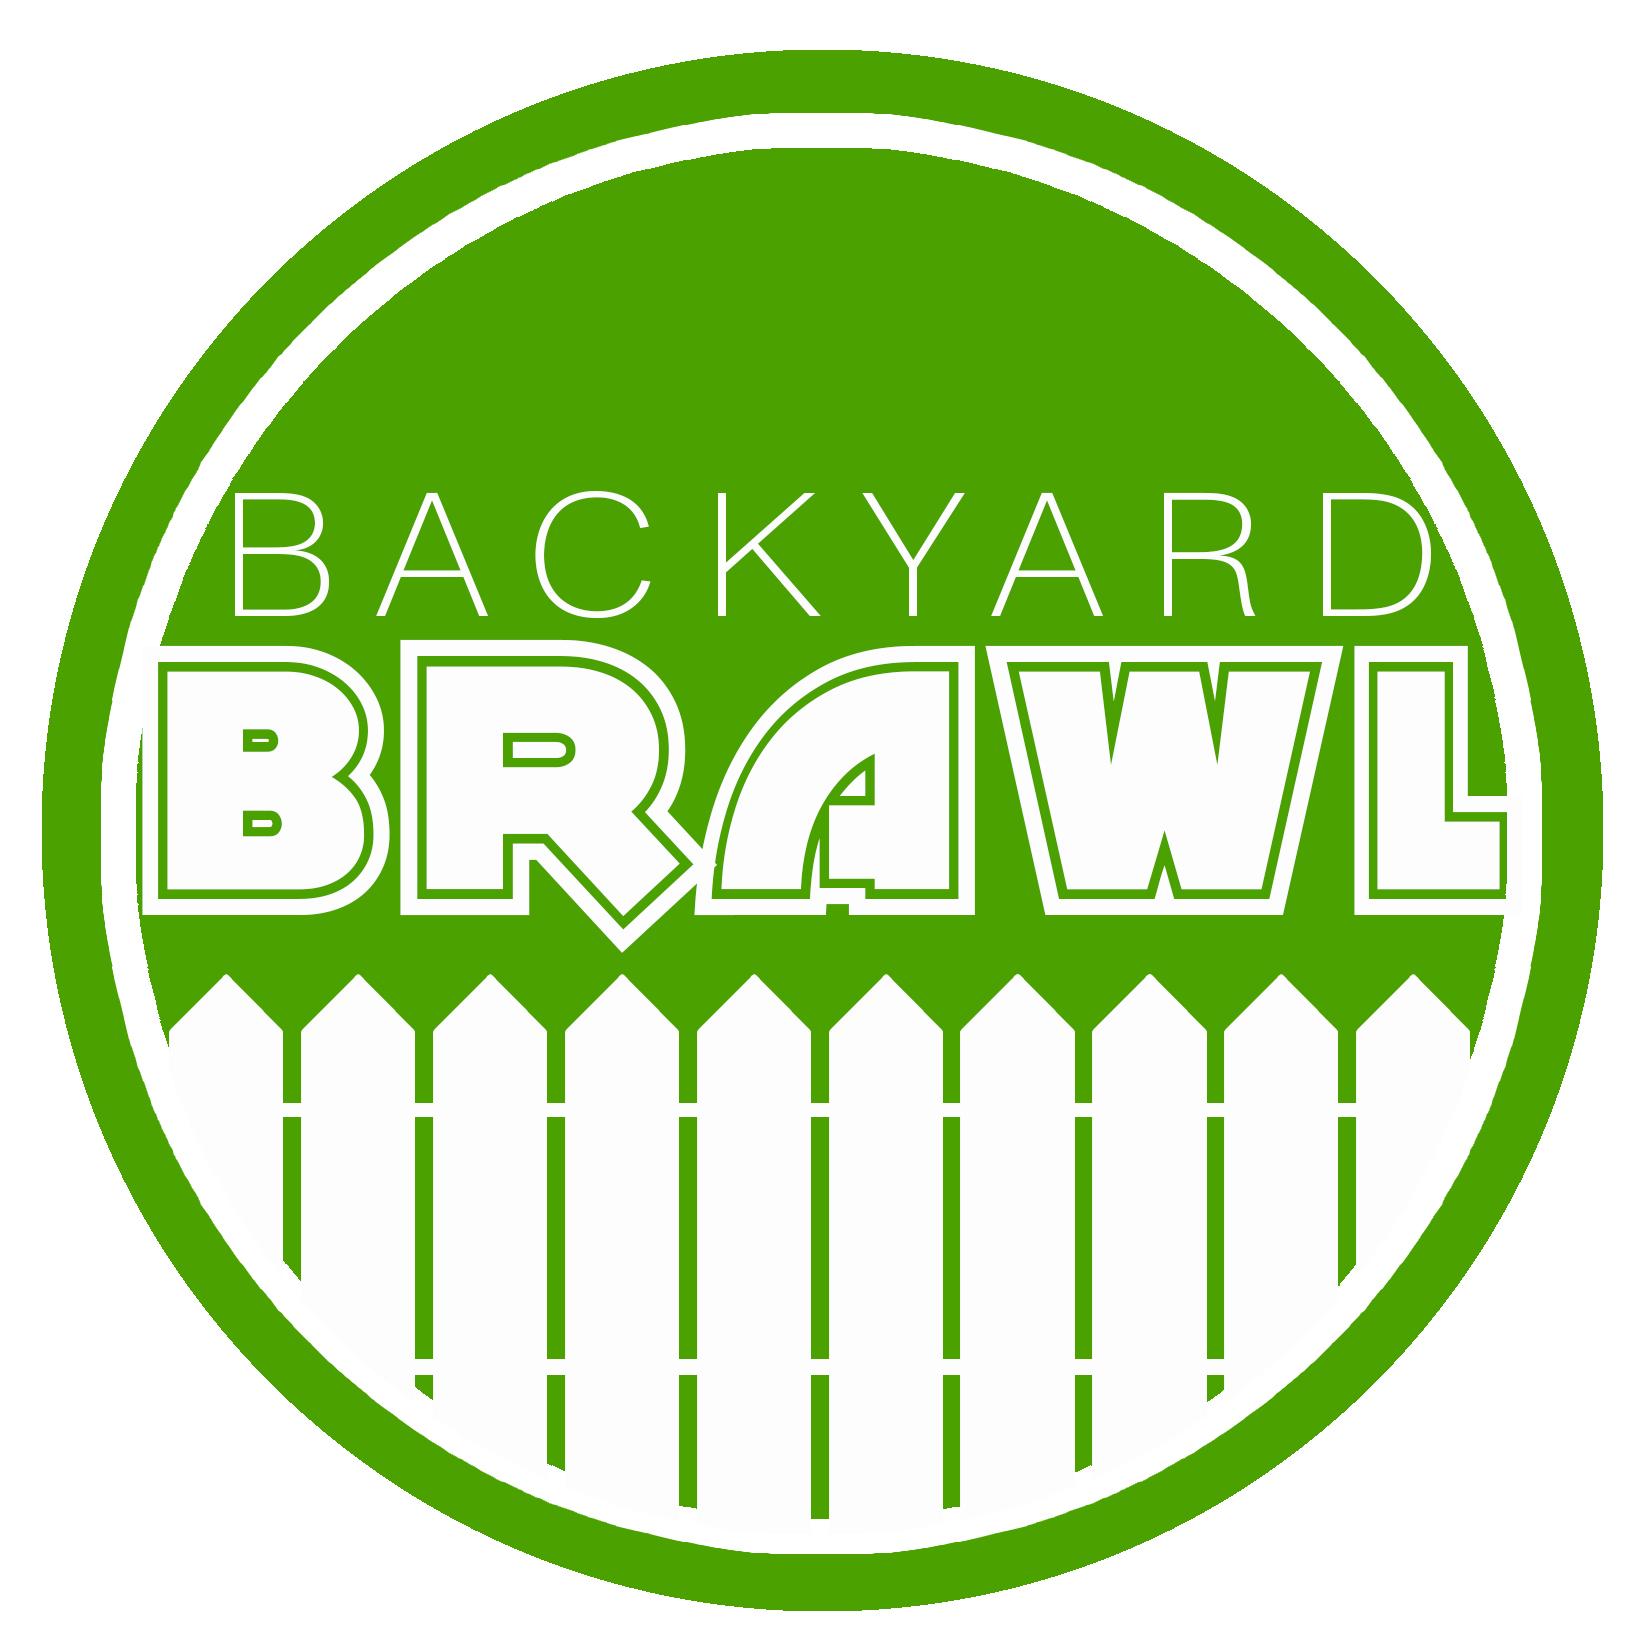 Backyard Brawl Logo